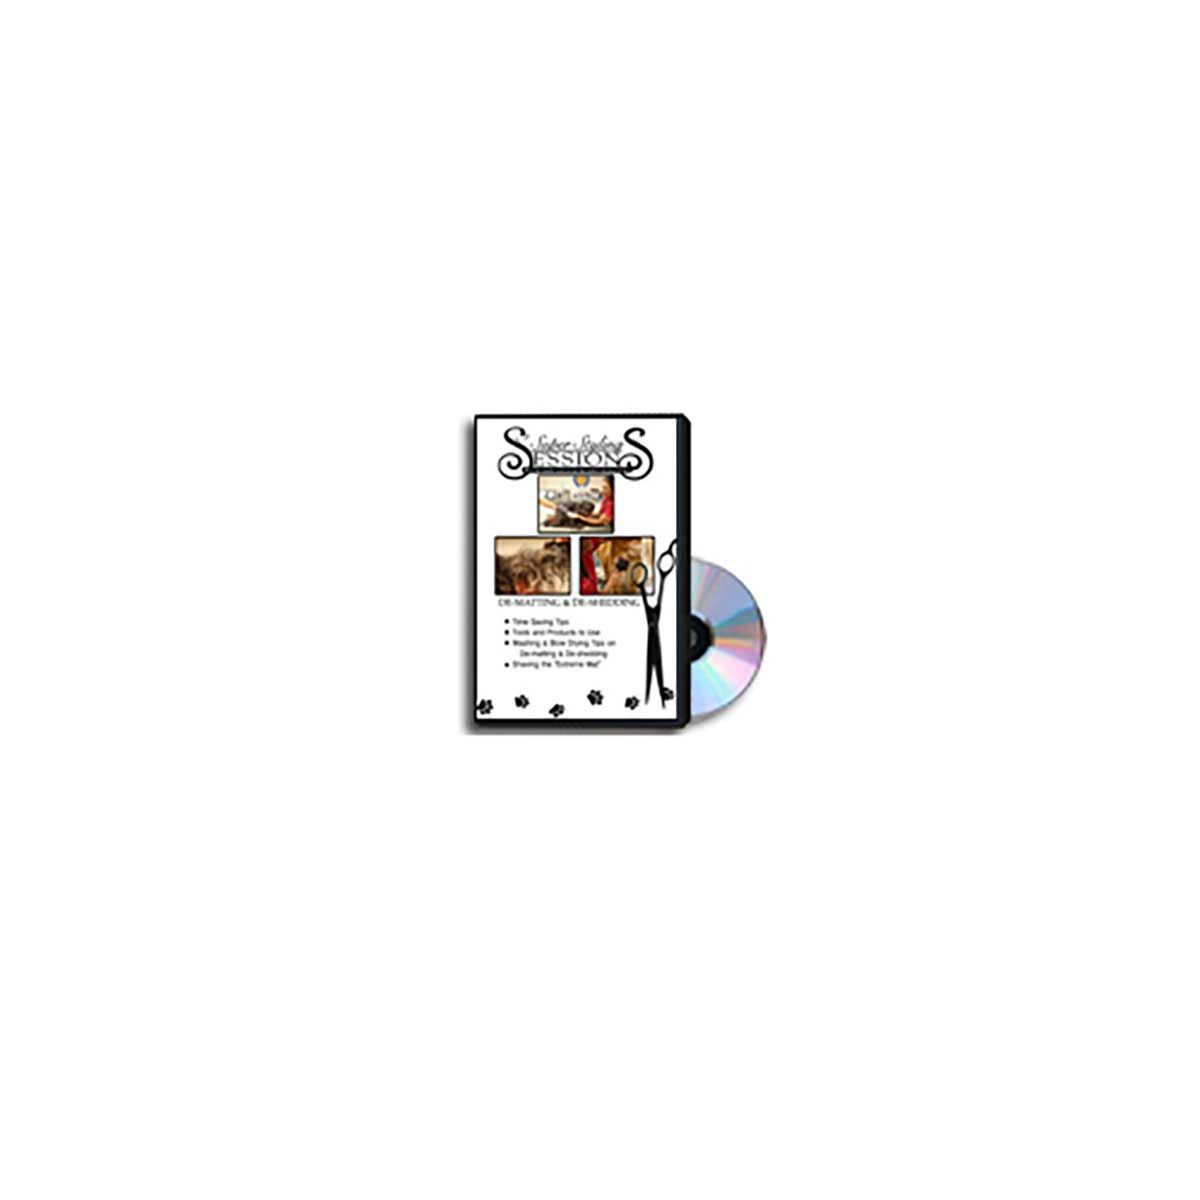 Super Styling Sessions - De-Matting & De-Shedding DVD